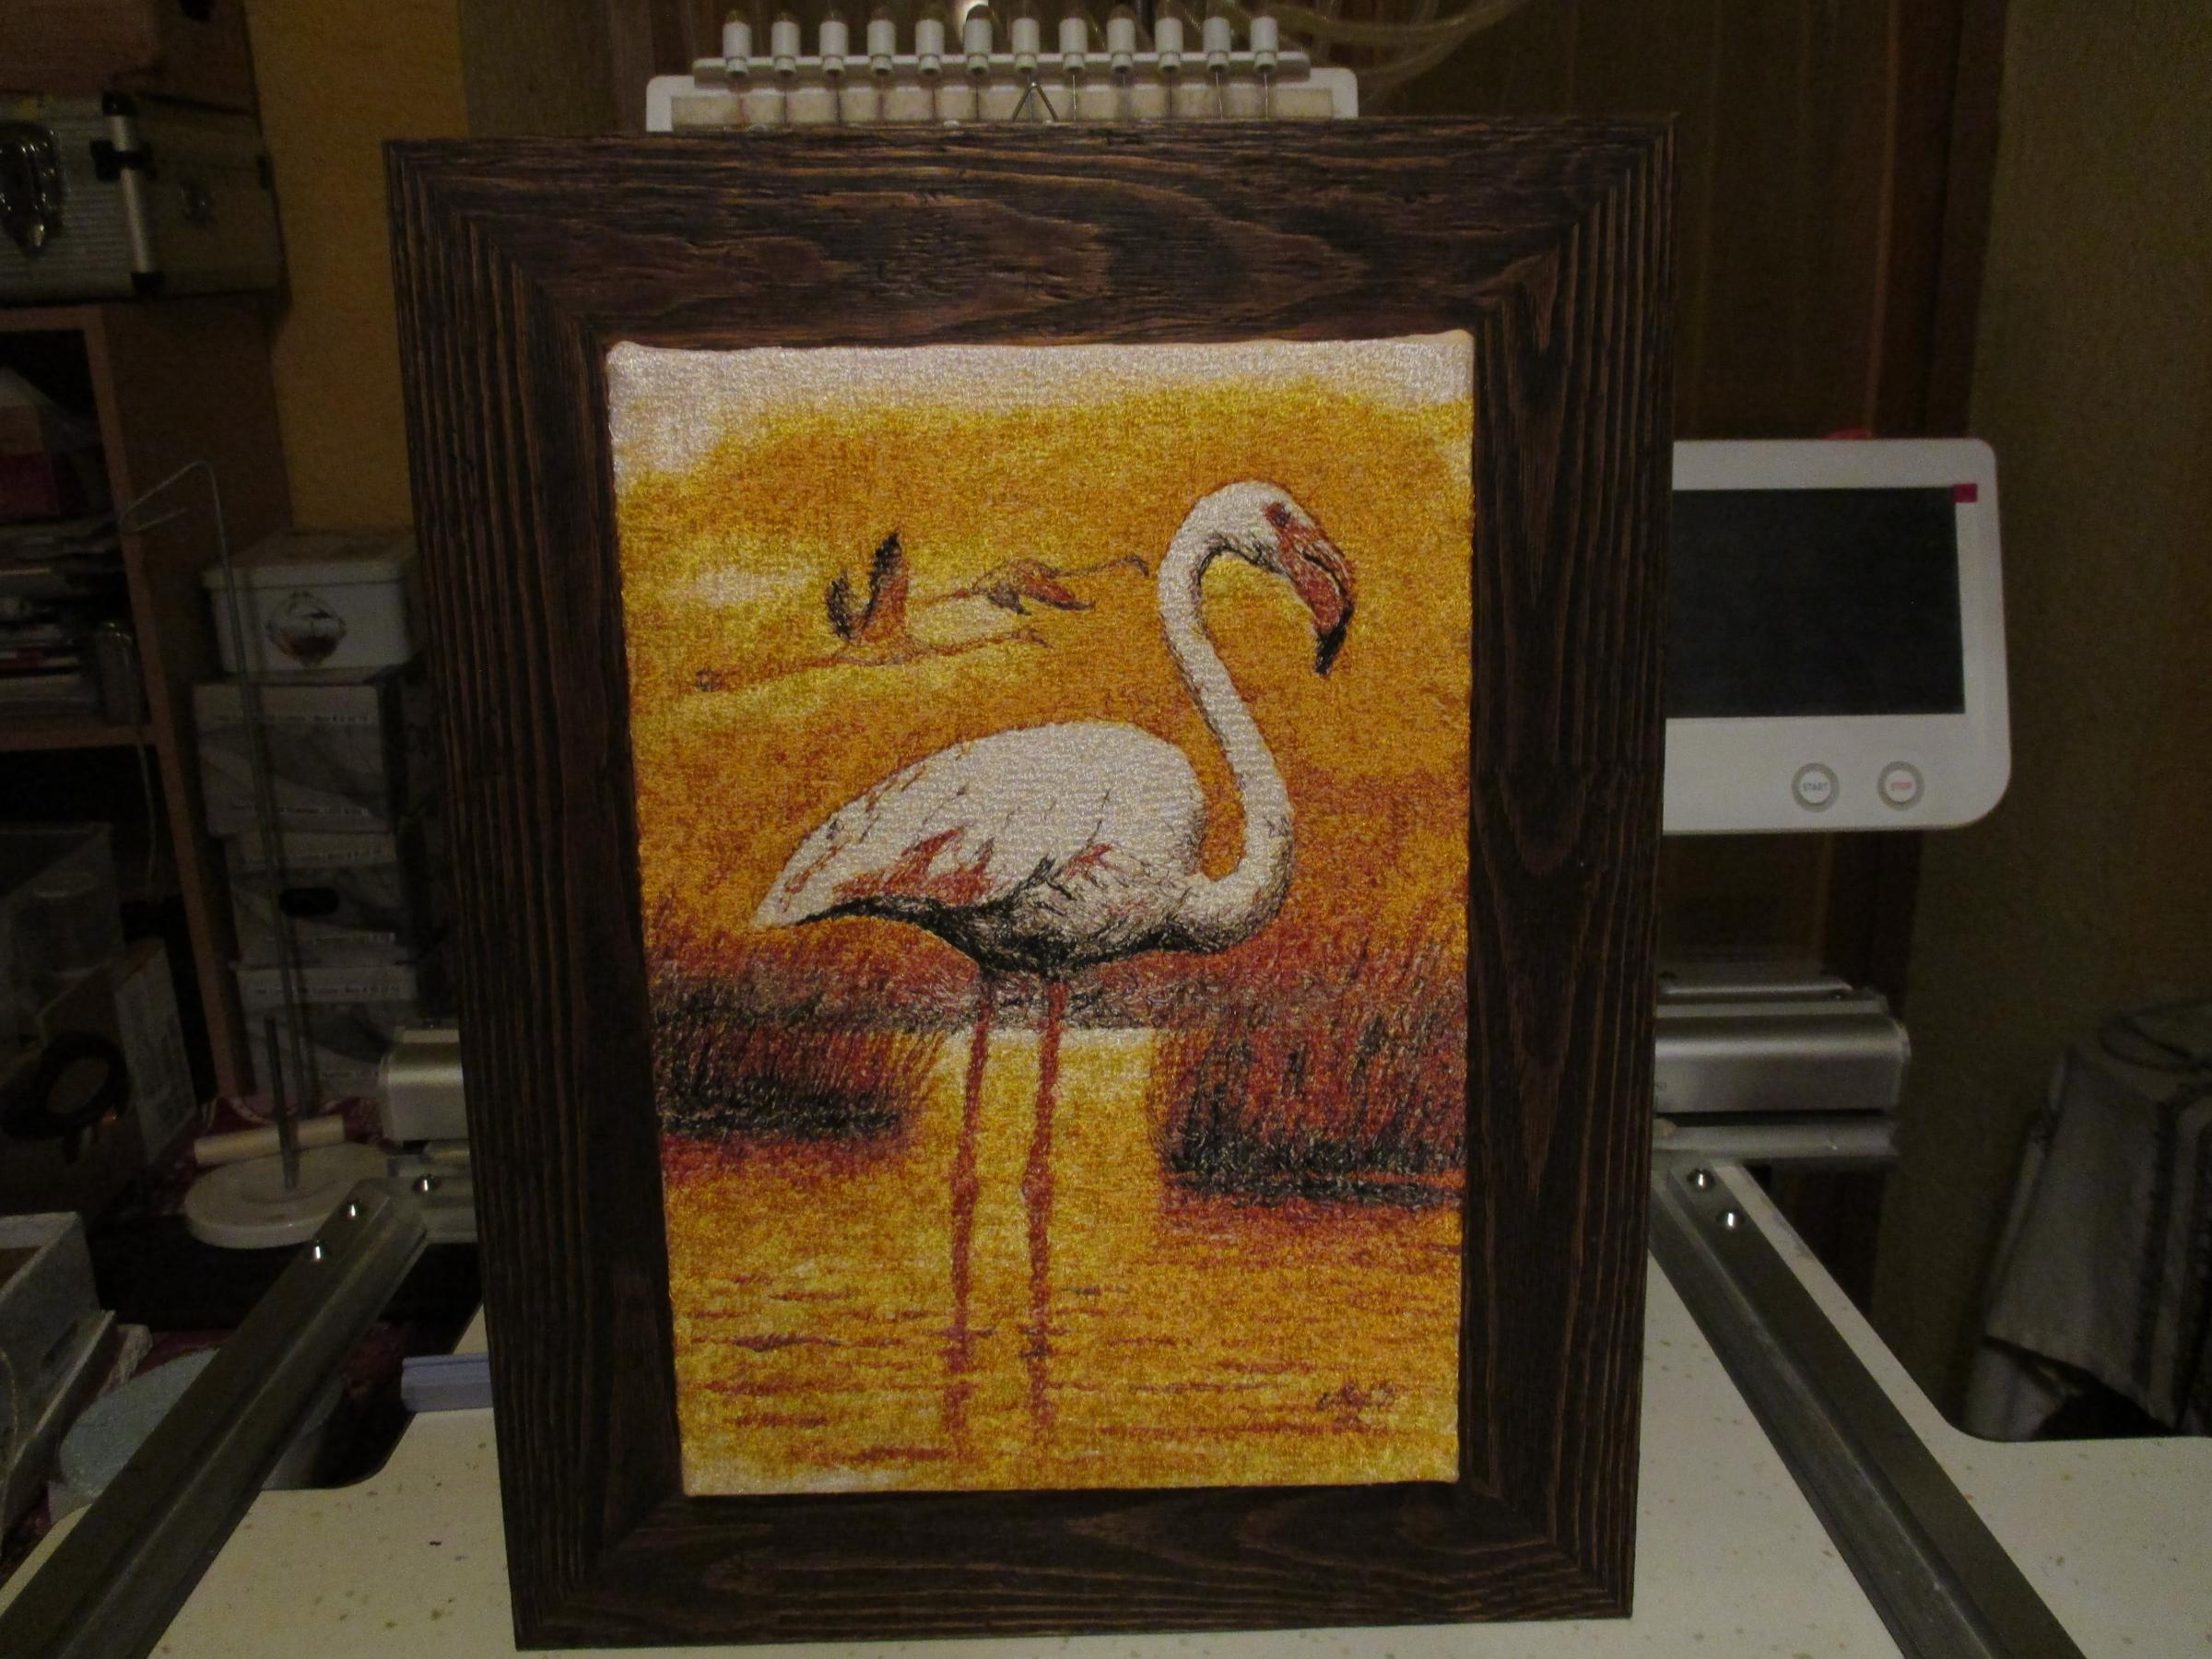 Finished flamingo freeembroidery design